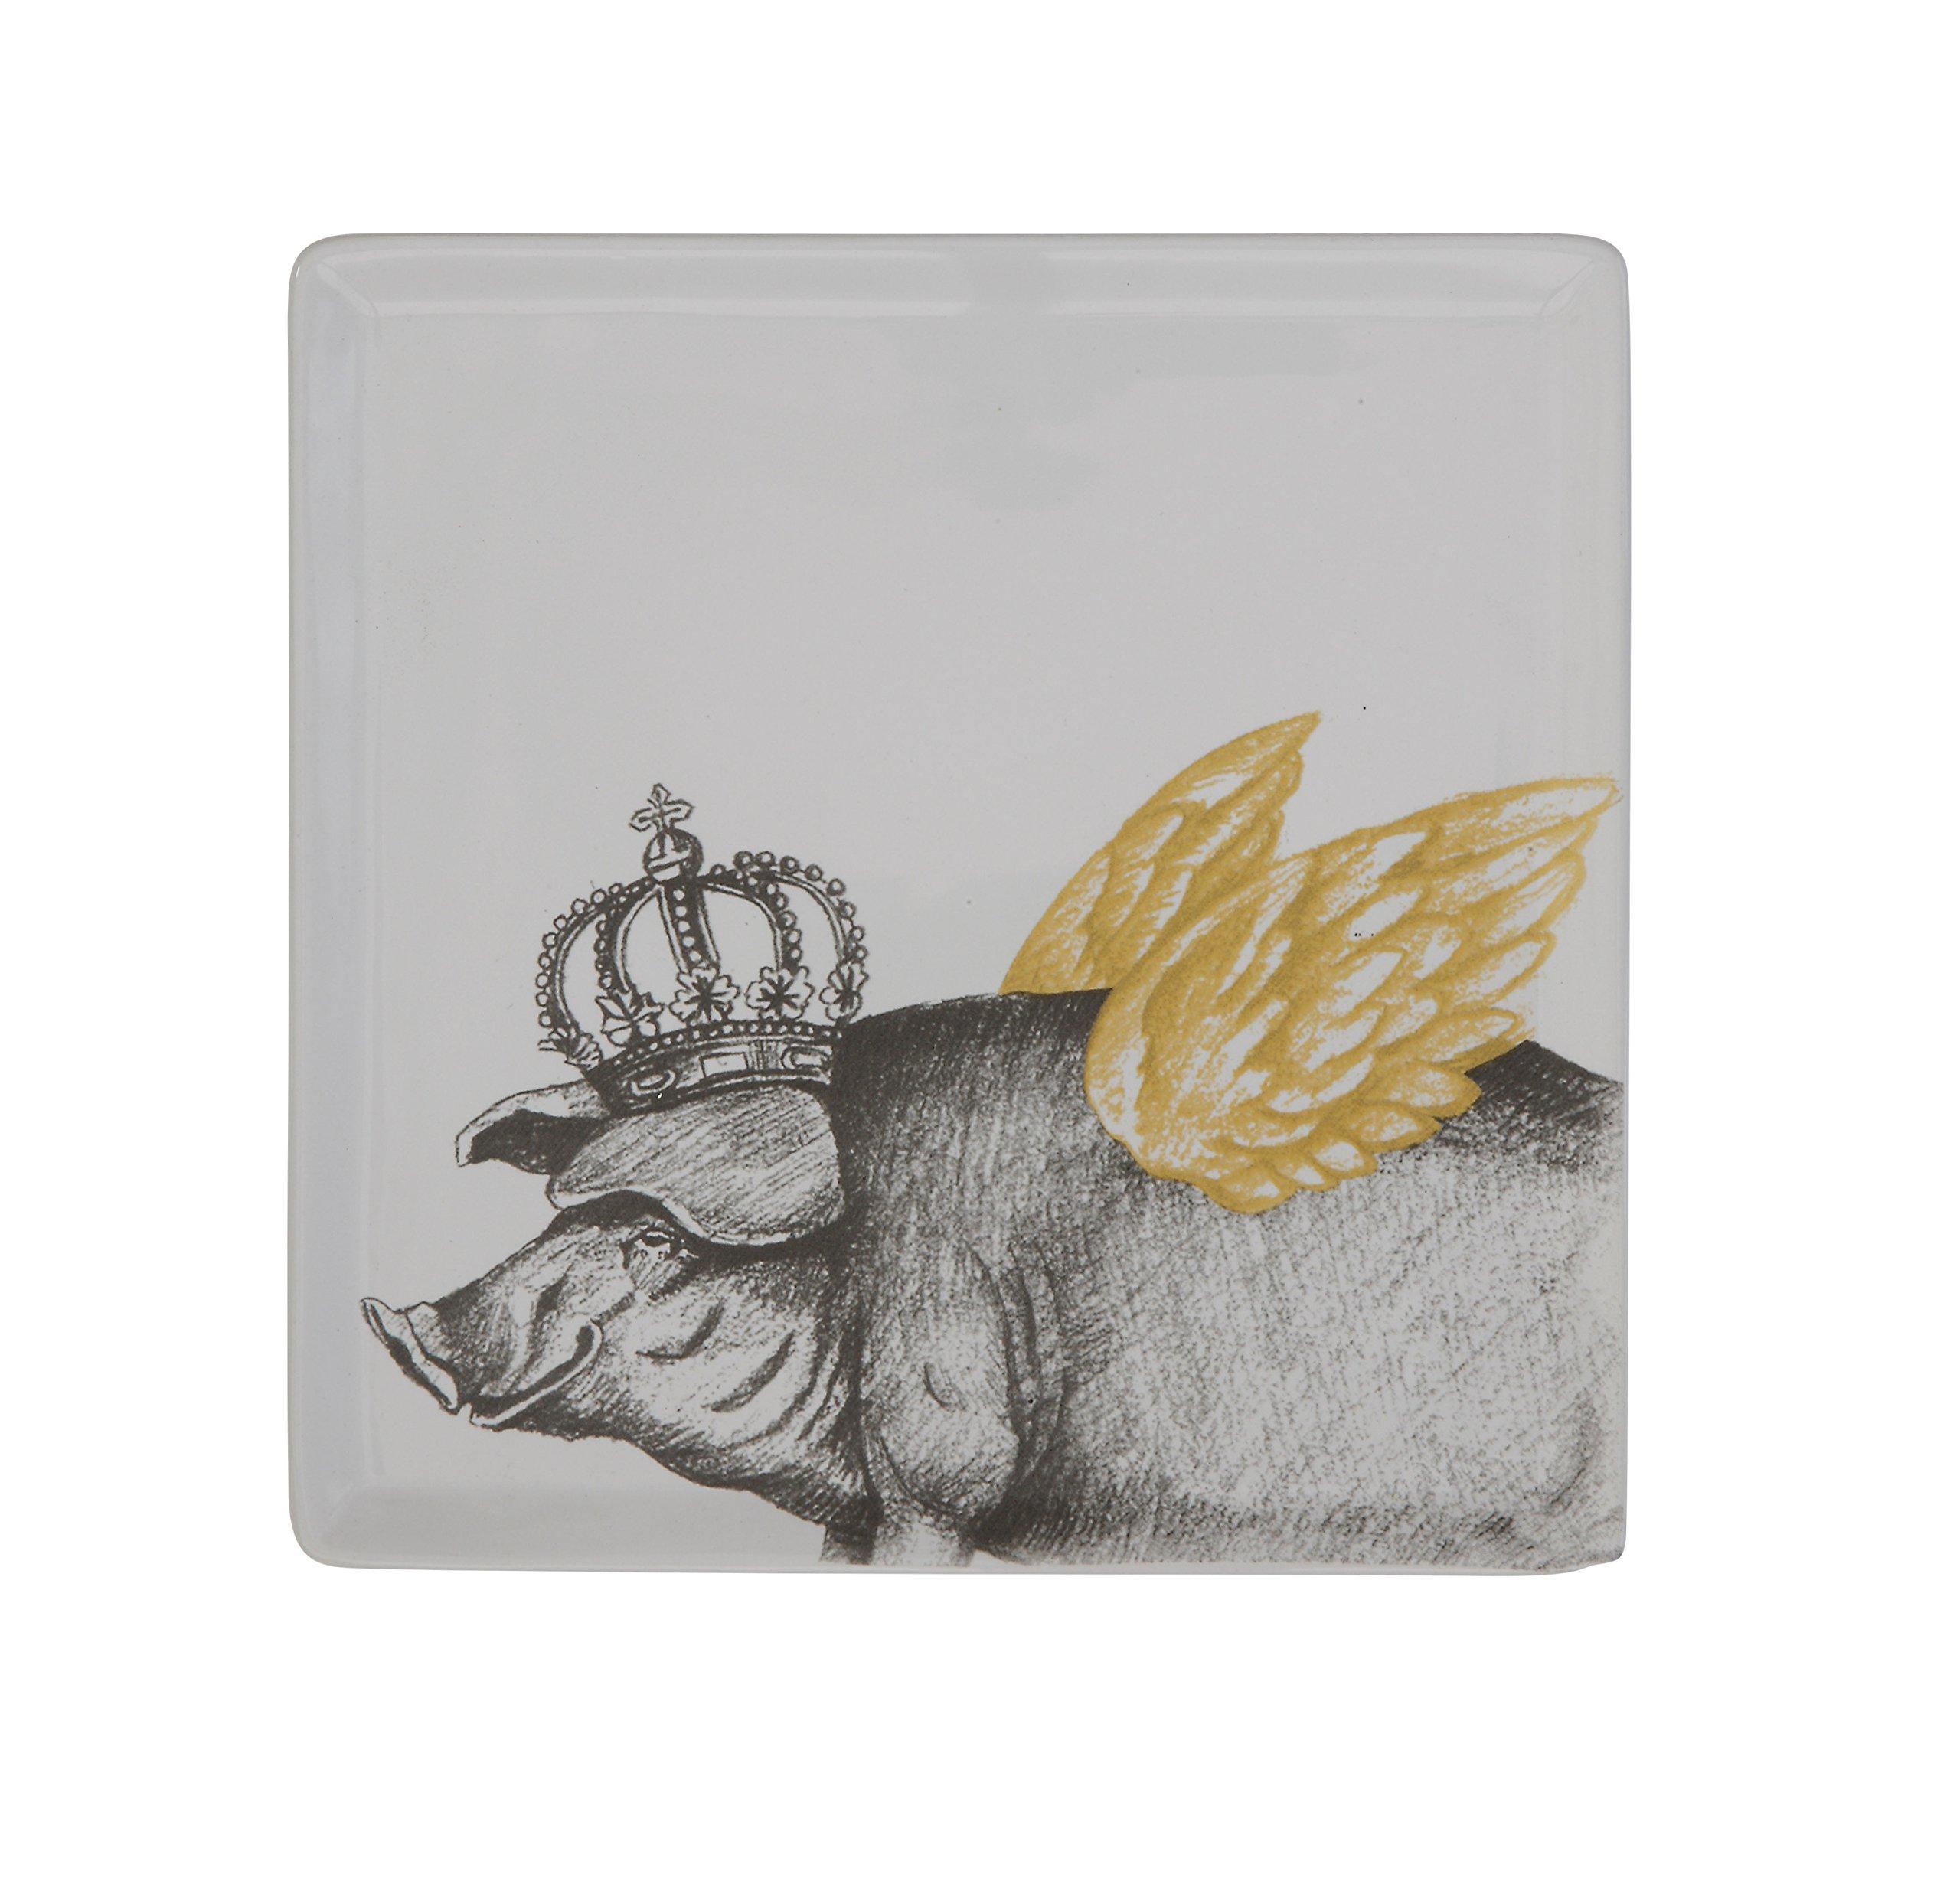 Creative Co-Op DA7780 Ceramic Plate with Pig Decal, Multicolor